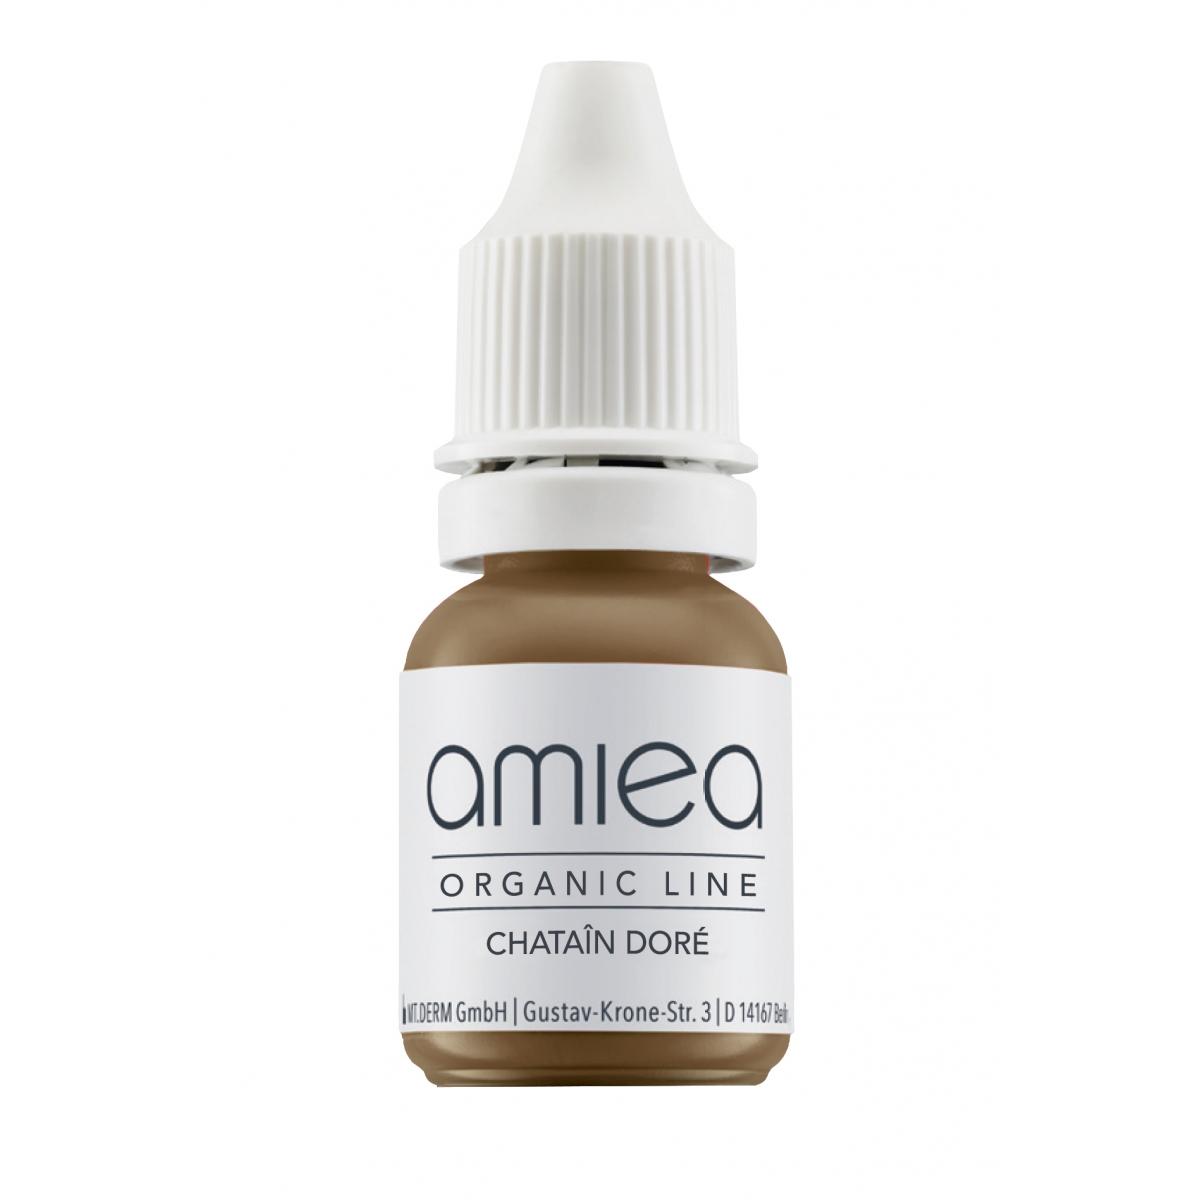 ORGANIC LINE (5ml)  - PIGMENT CHATAIN DORE ORGANICLINE AMIEA (5 ml)